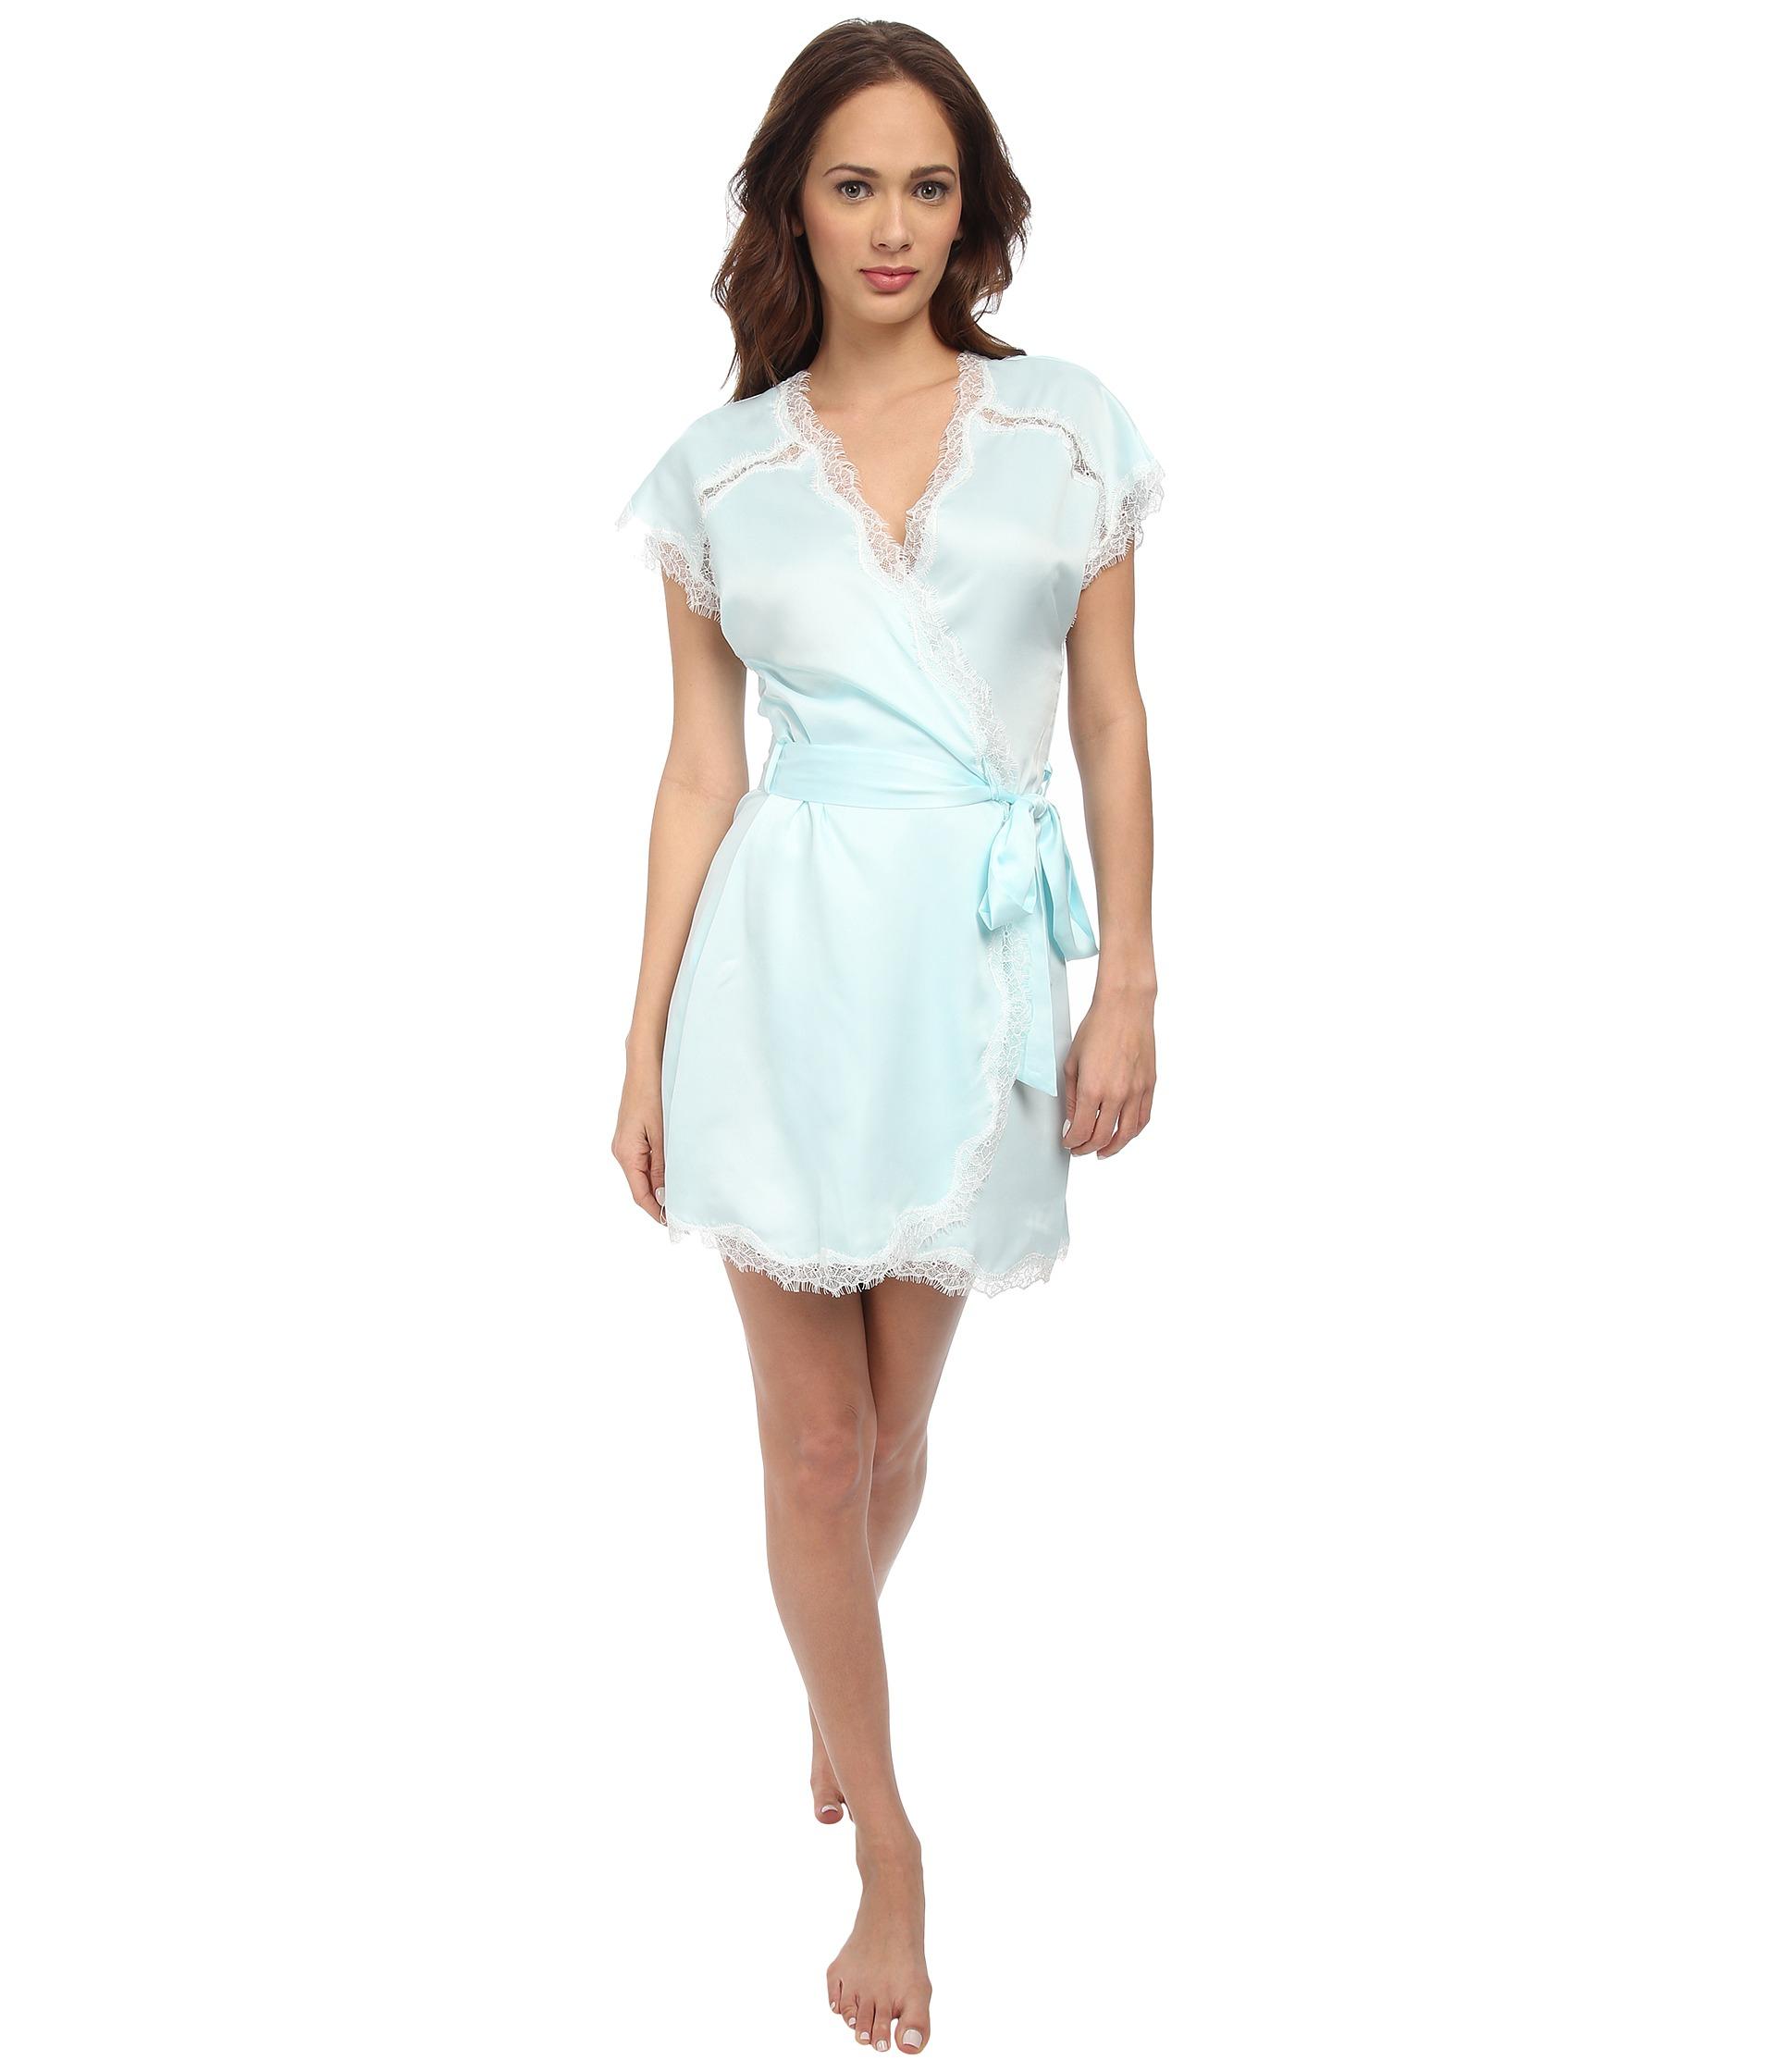 Betsey johnson satin robe in blue betty blue lyst for Robes de mariage de betsey johnson